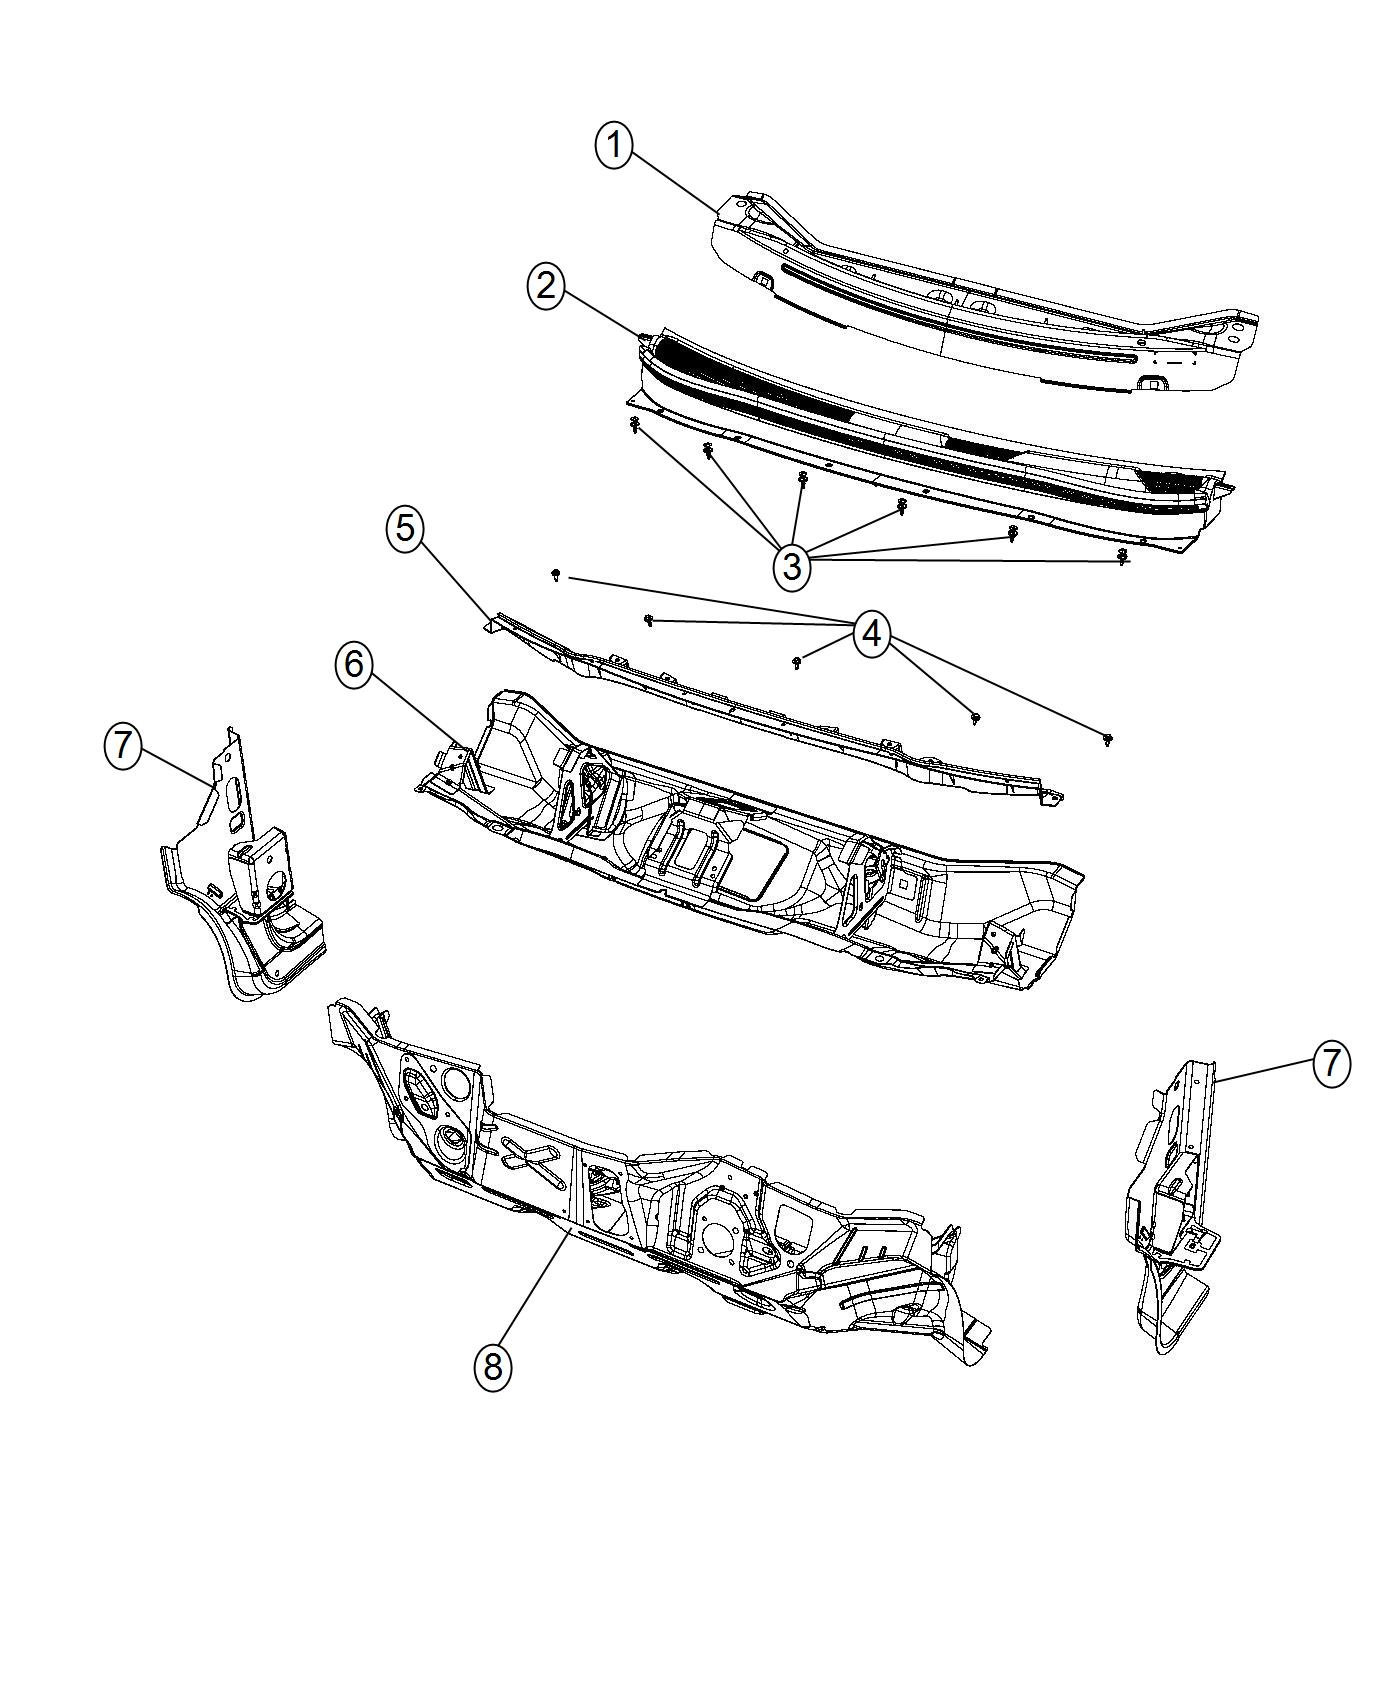 Jeep Liberty Dash Diagram